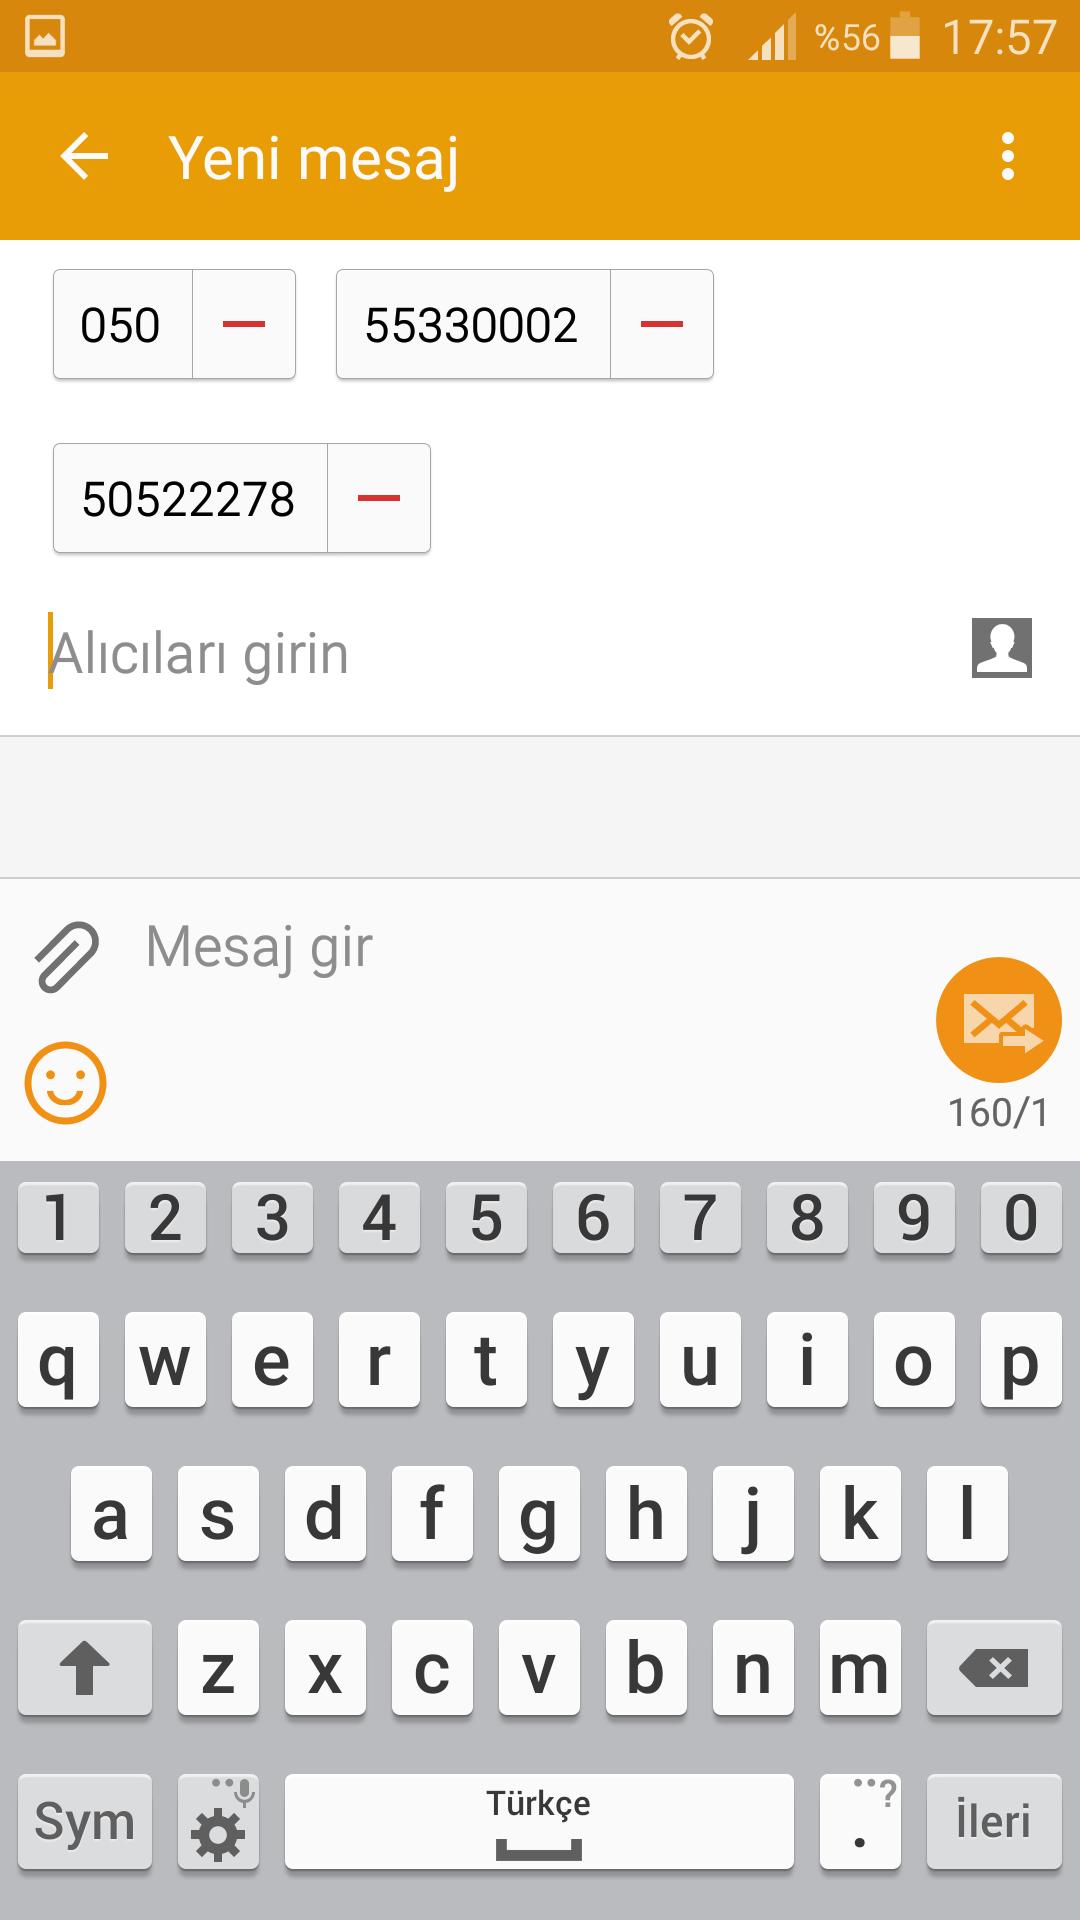 Samsung telefonda toplu mesaj gönderme